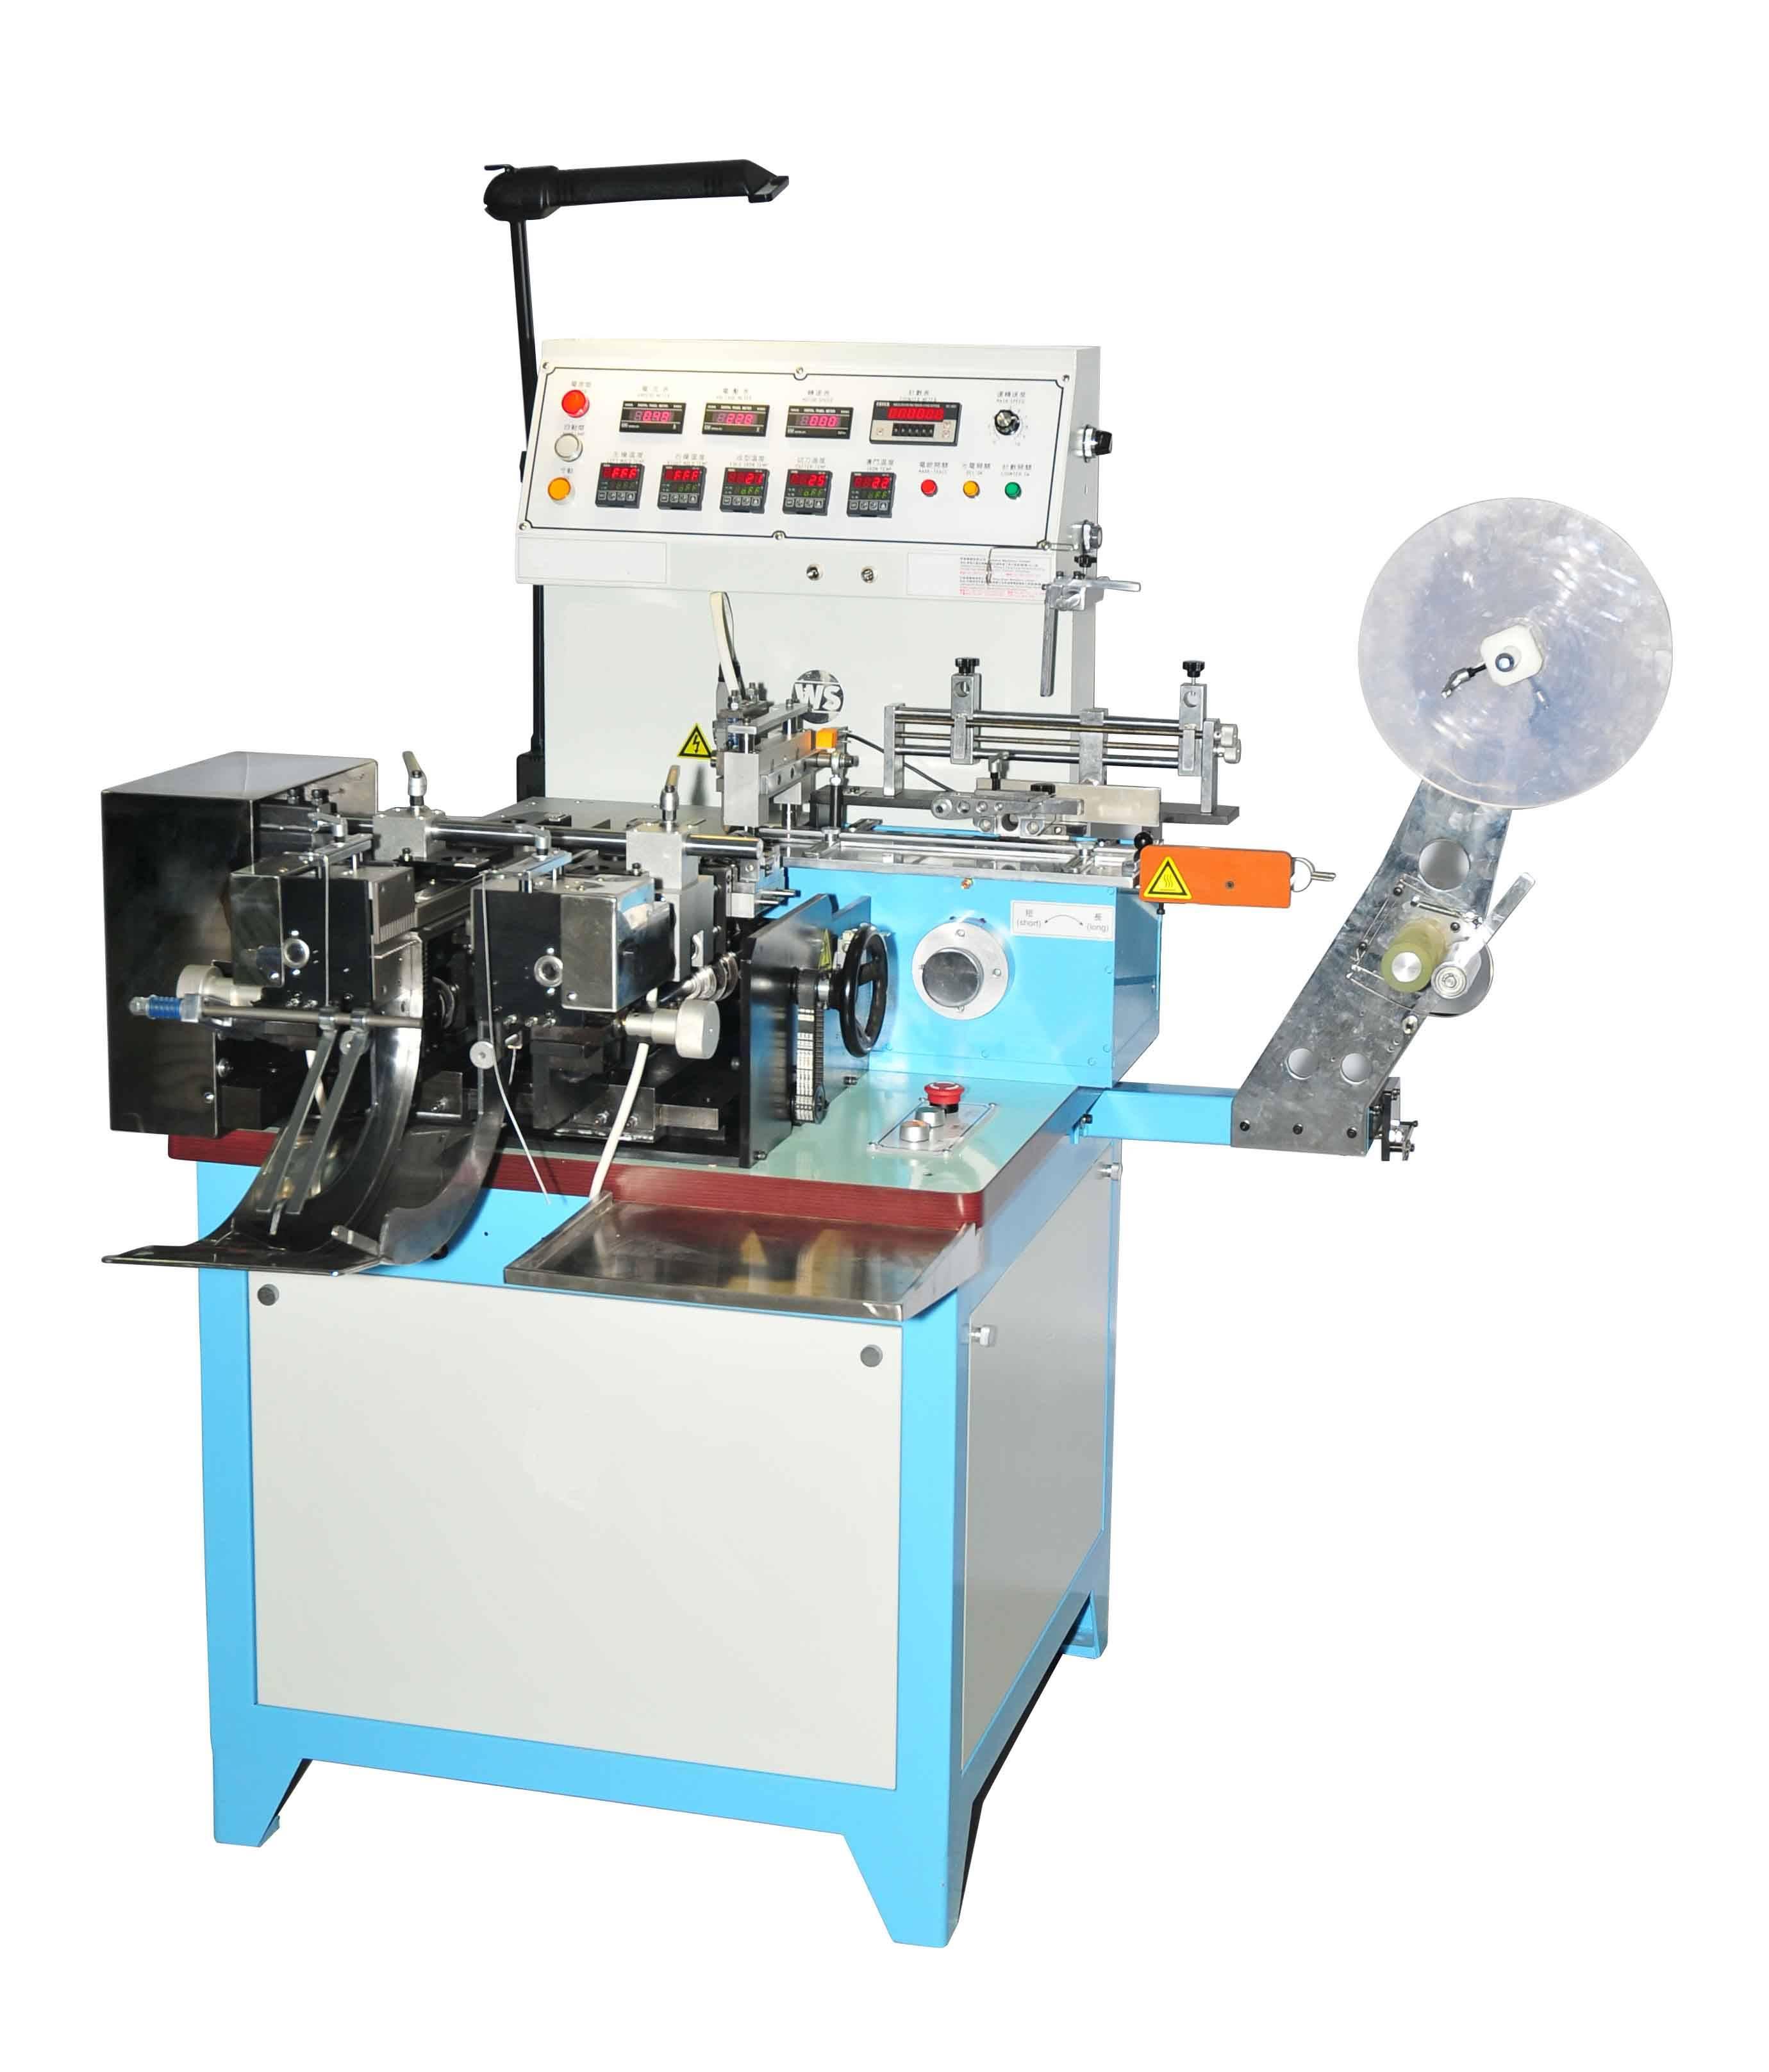 Multi-Function Label Cutting & Folding Machine (HY-586S)